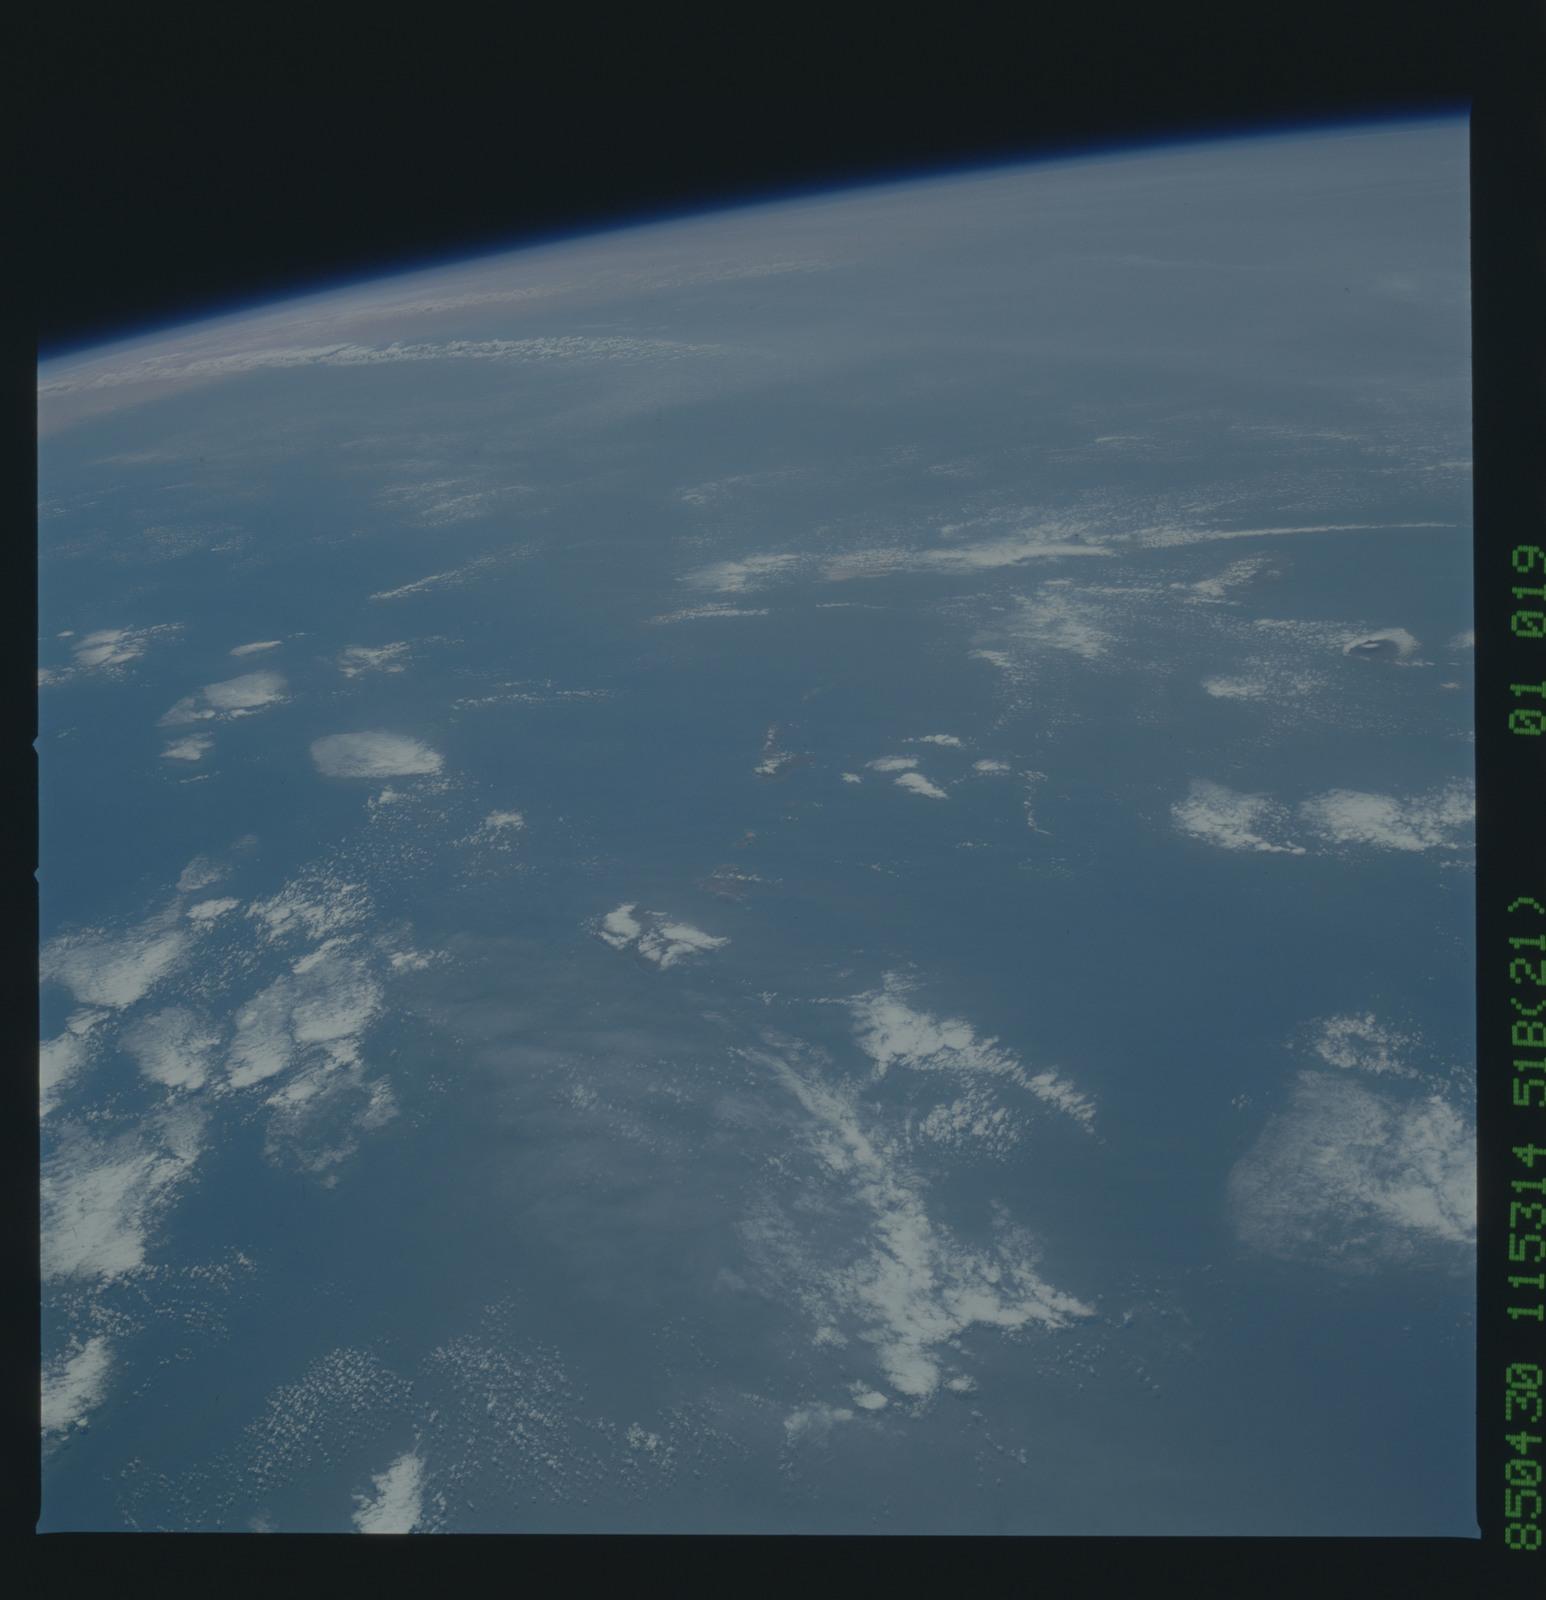 51B-31-068 - STS-51B - 51B earth observation